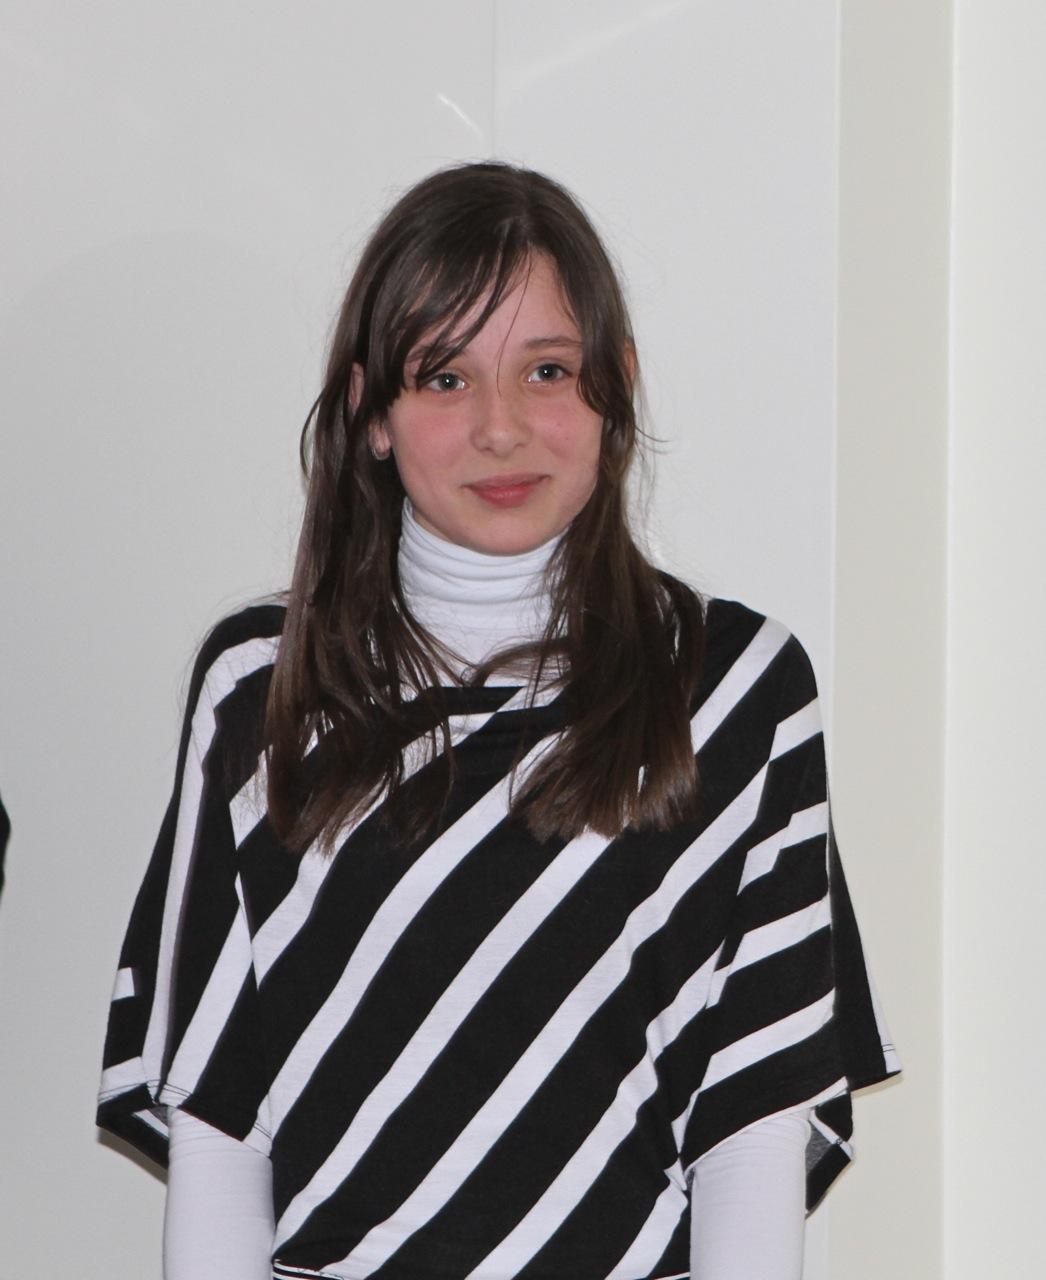 Paulina Rychlewska